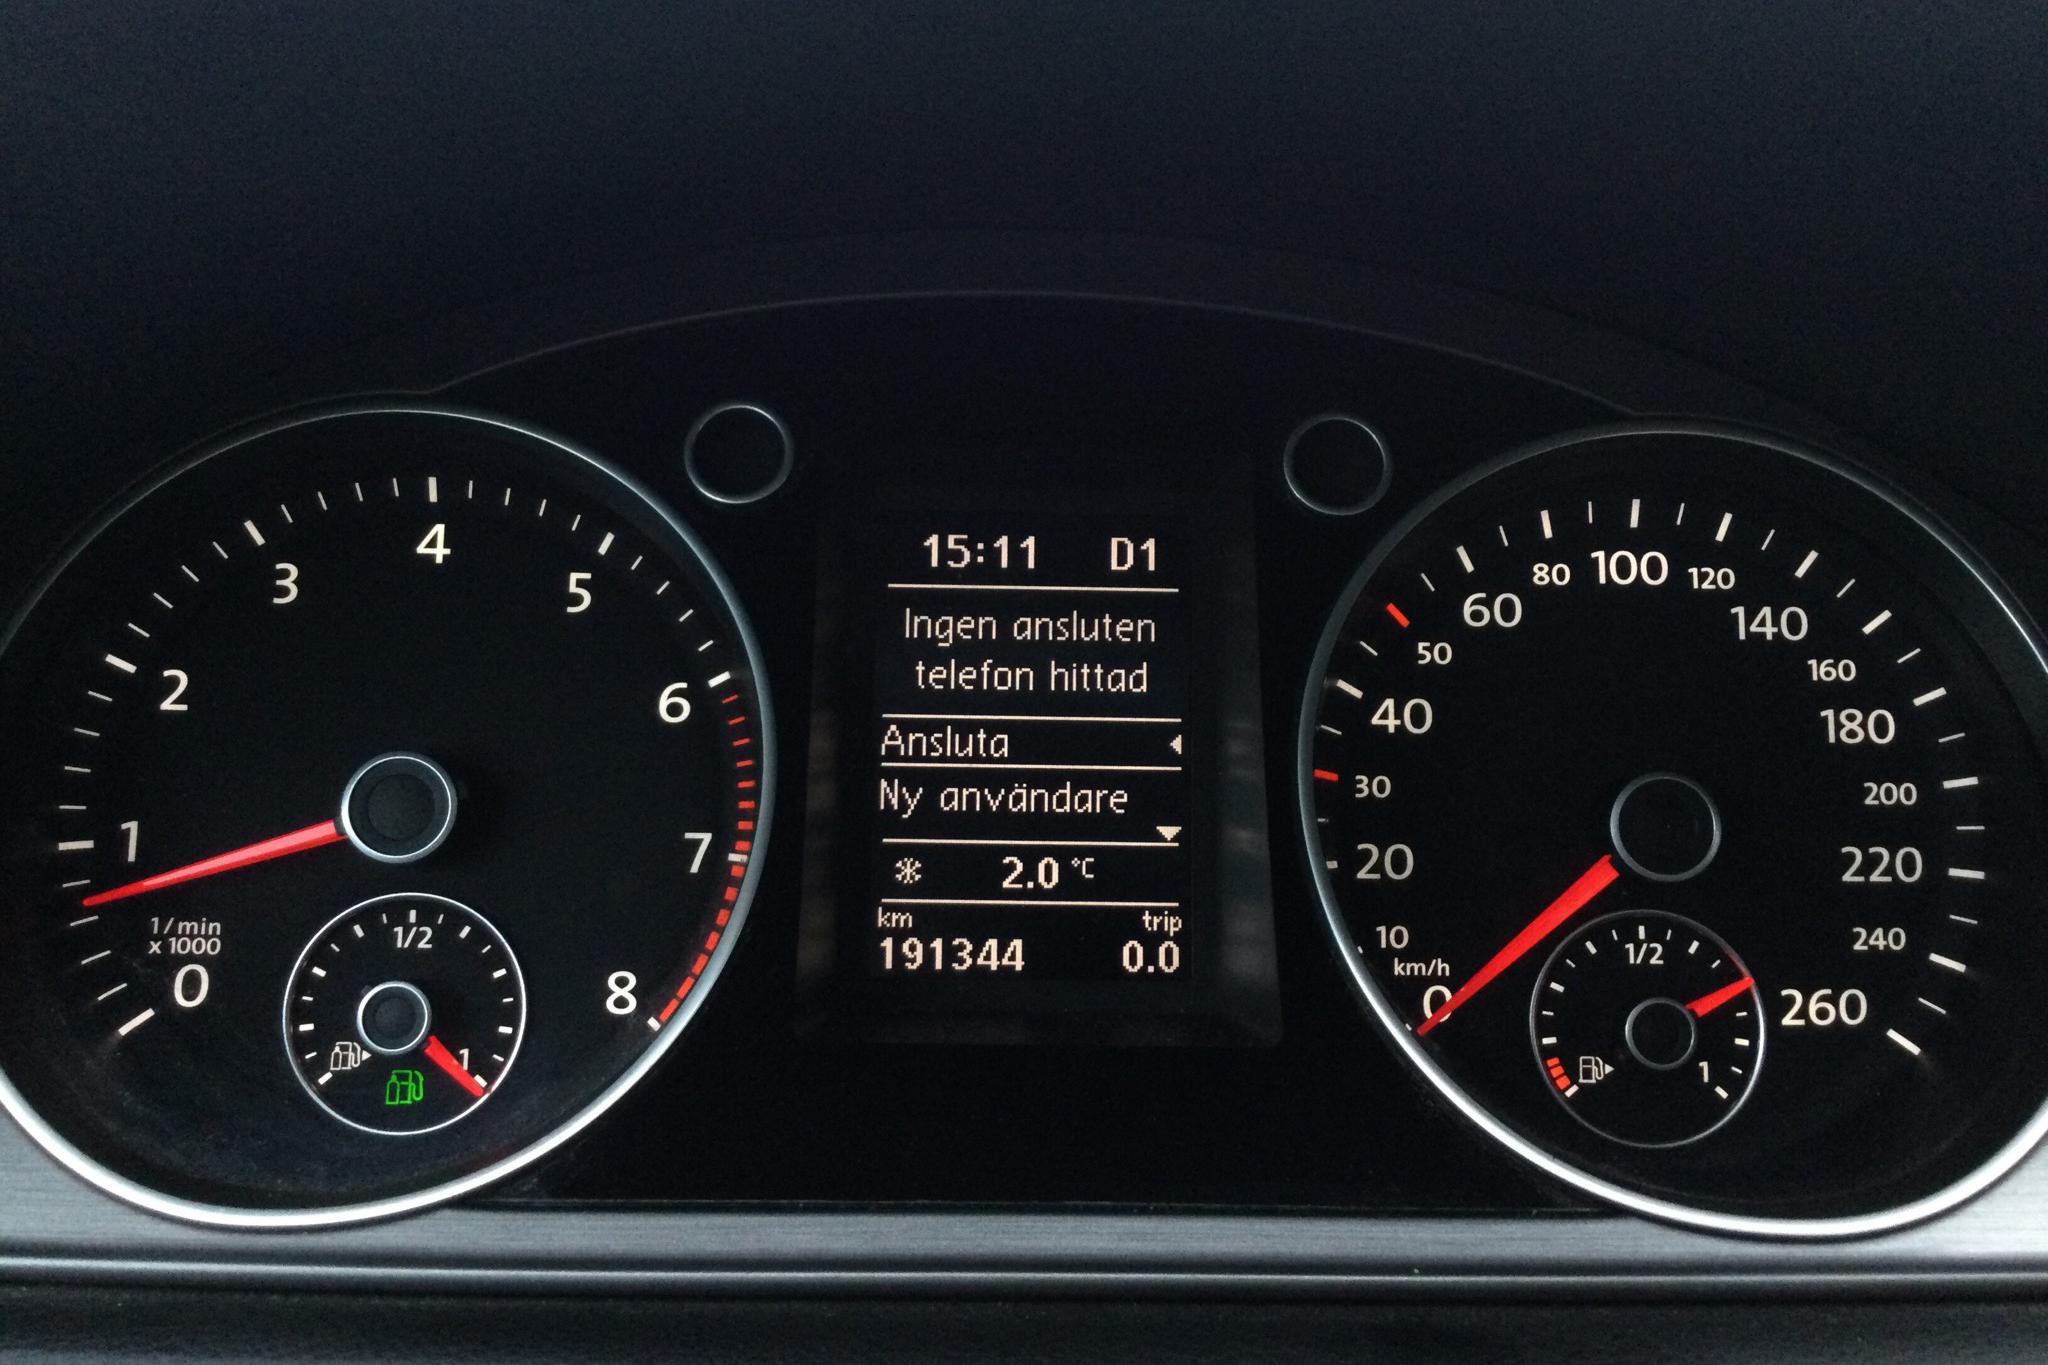 VW Passat 1.4 TSI EcoFuel Variant (150hk) - 191 340 km - Automatic - white - 2014